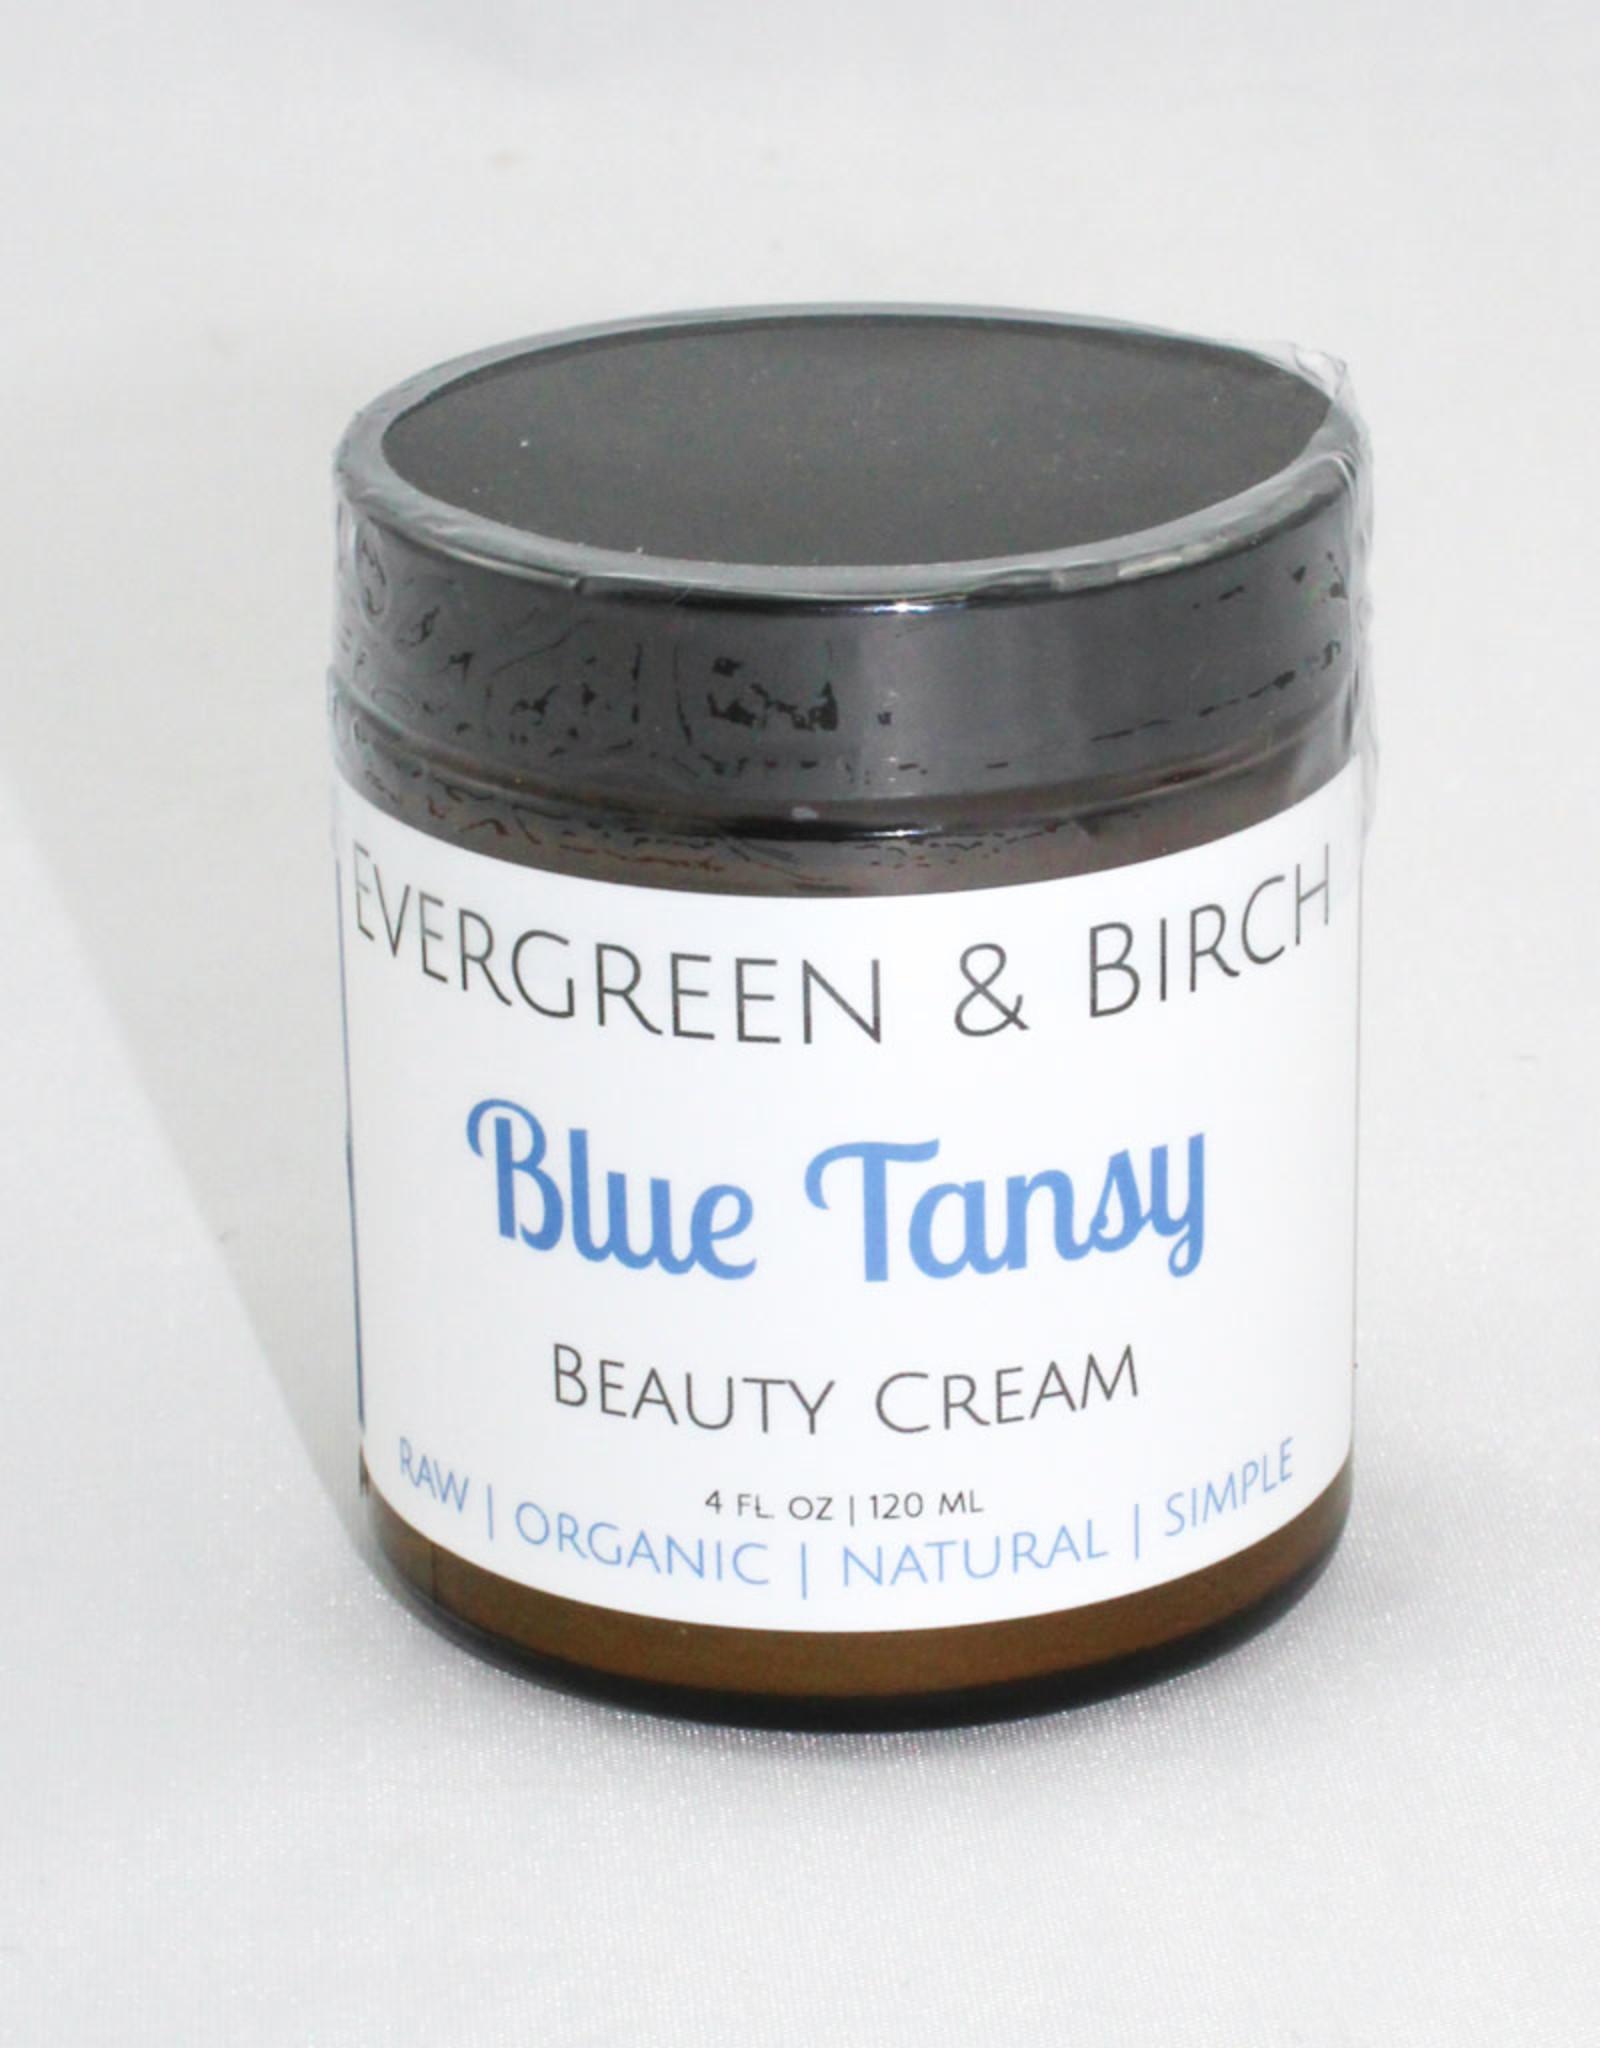 Evergreen & Birch Blue Tansy Beauty Cream